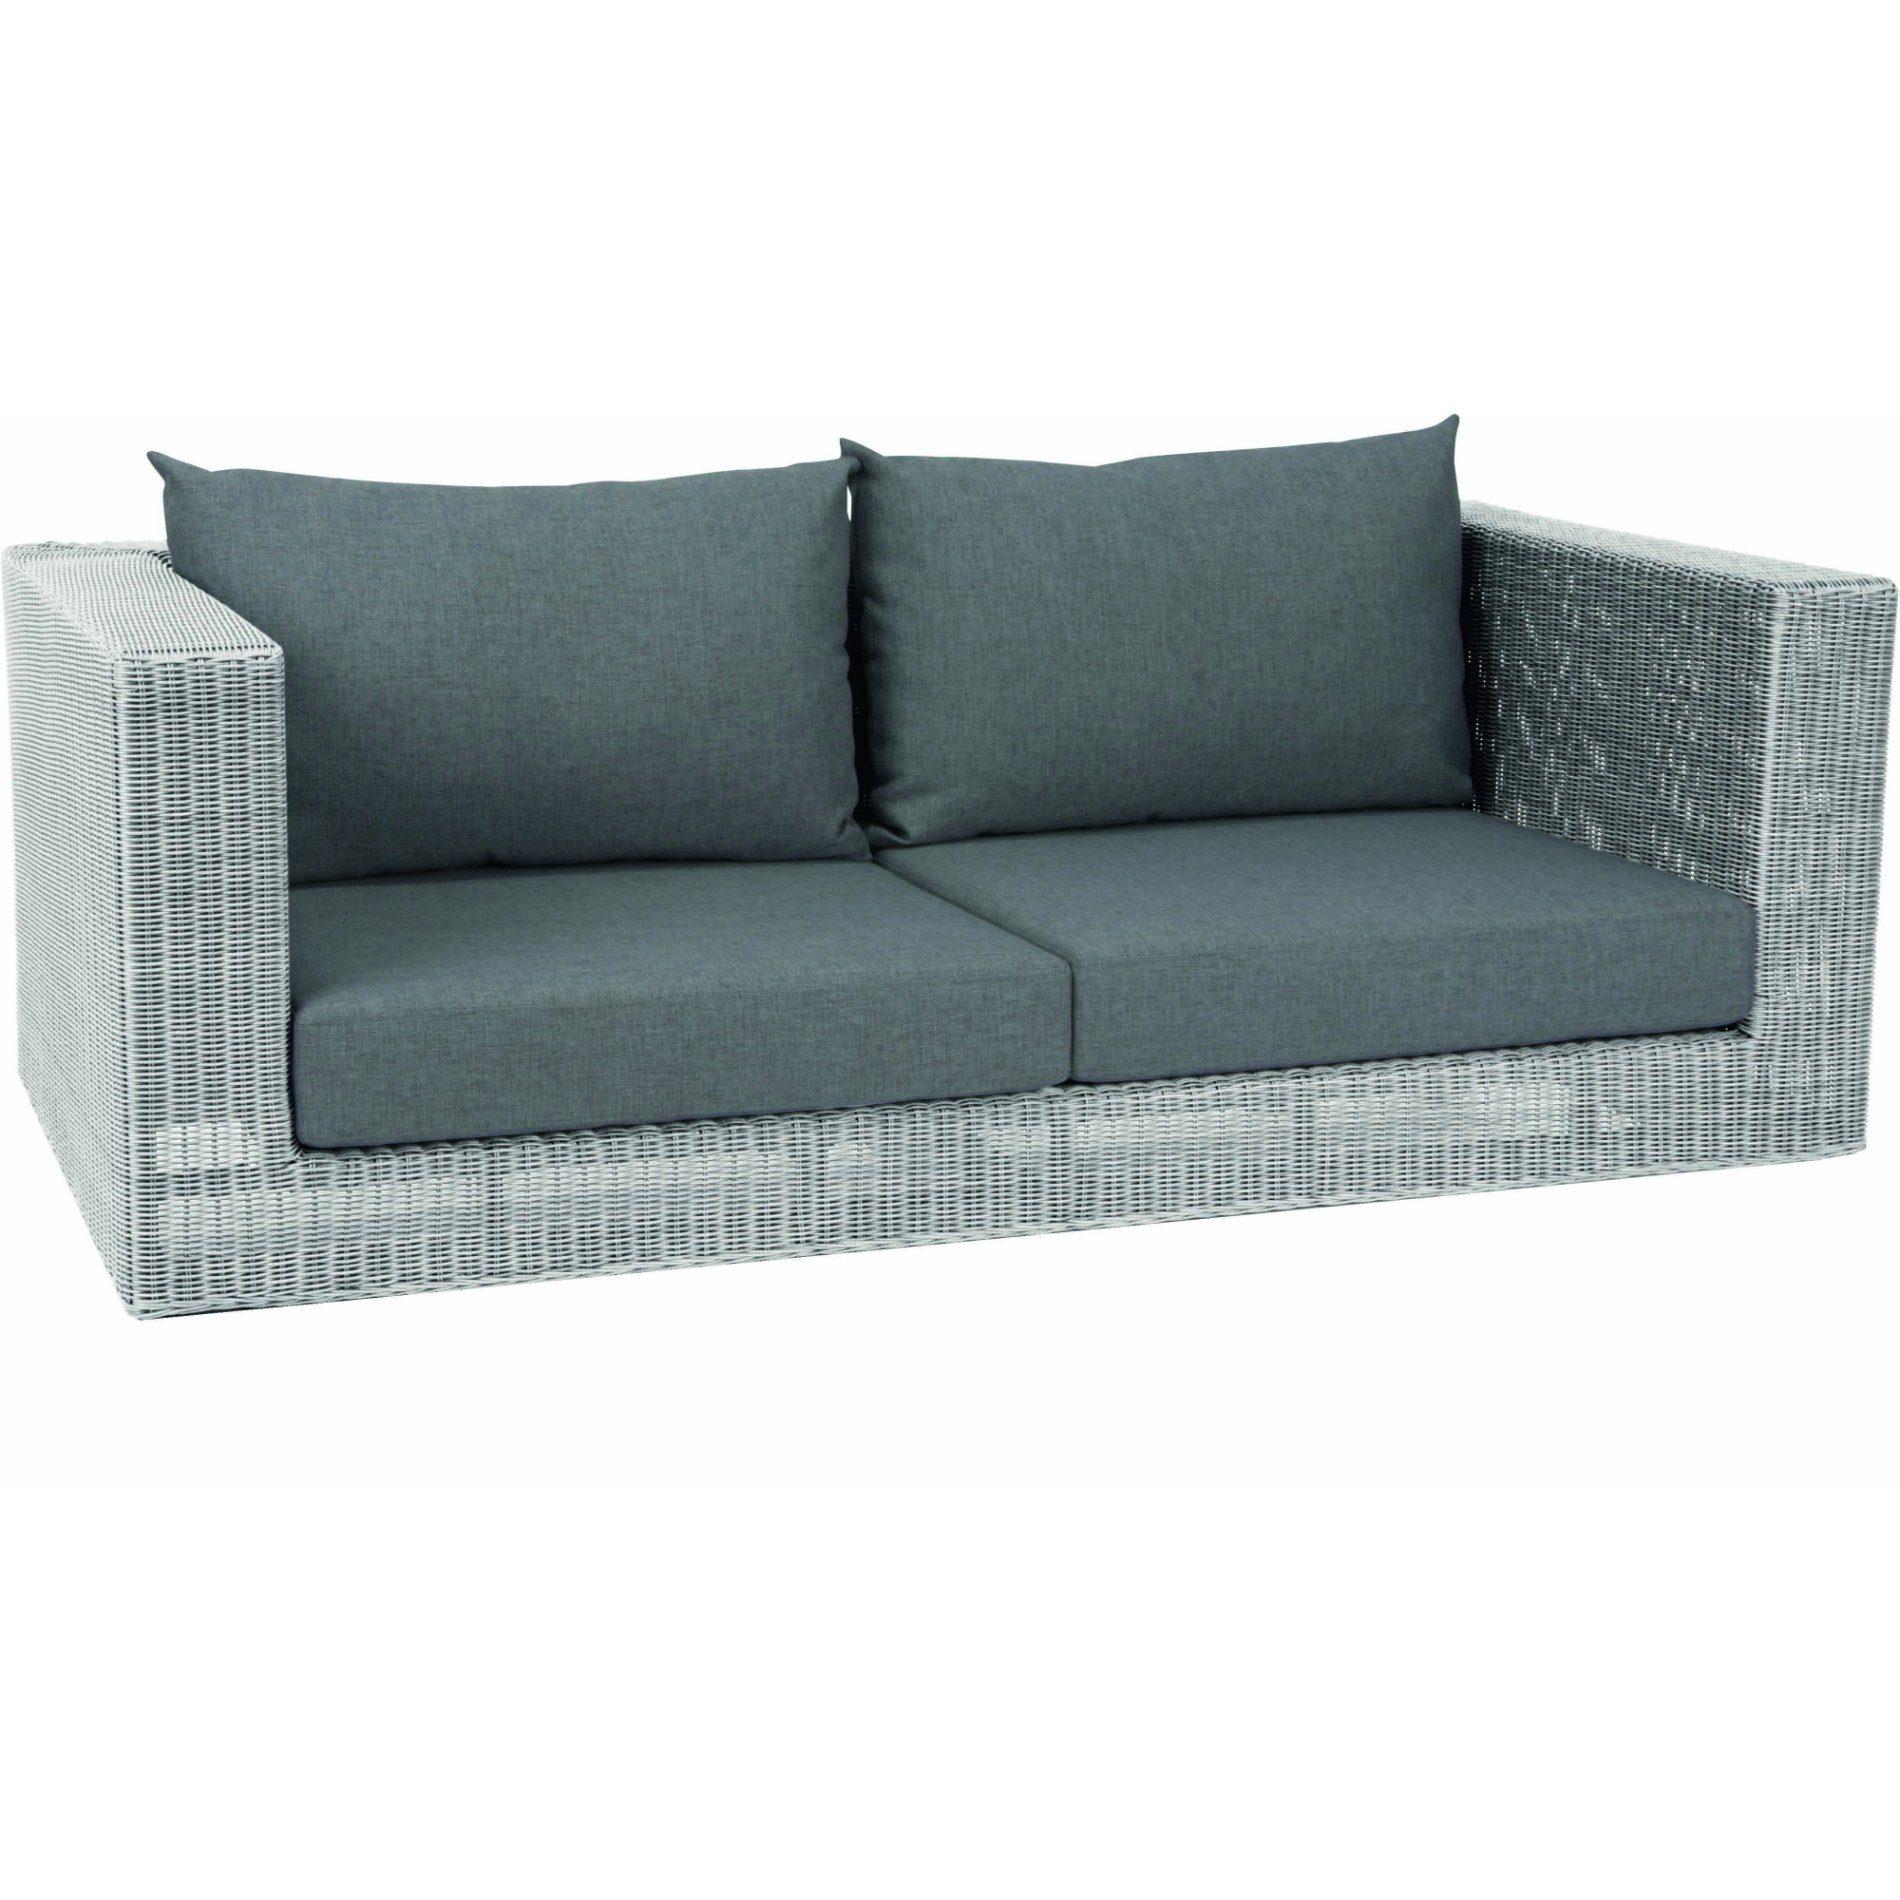 "Stern 2-Sitzer Sofa ""Fontana"", Geflecht Polyrattan Vintage weiß, Kissen seidengrau"